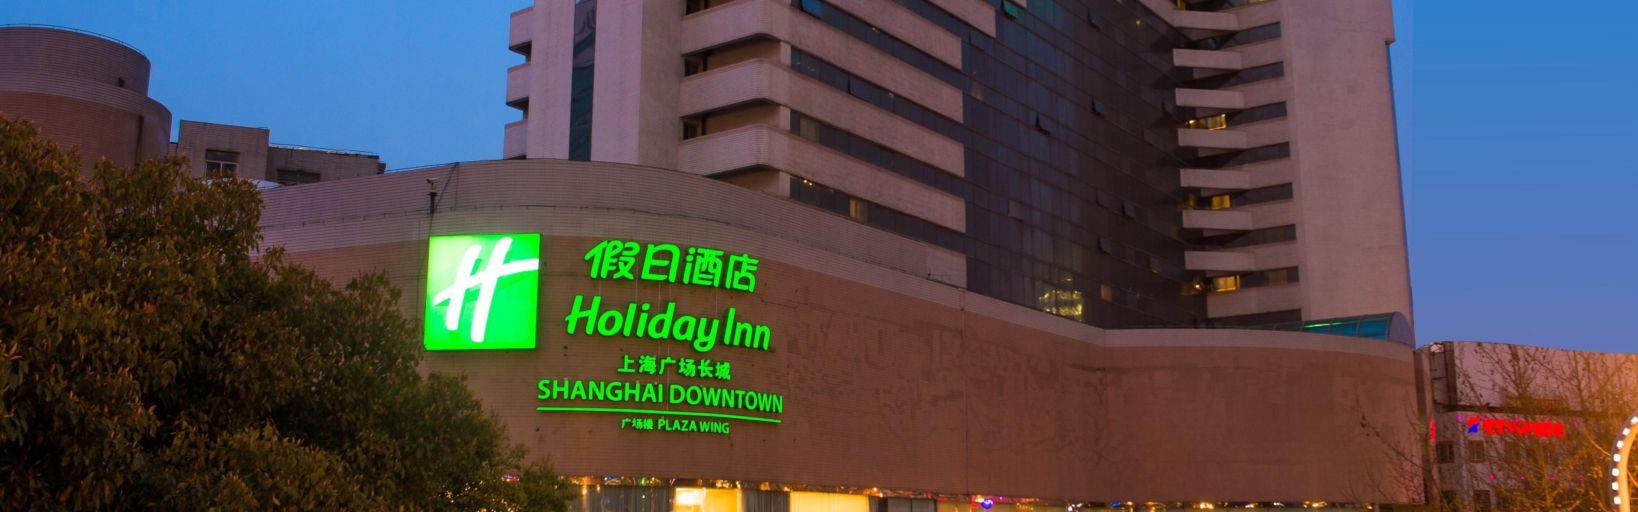 holiday inn shanghai downtown ihgのホテル